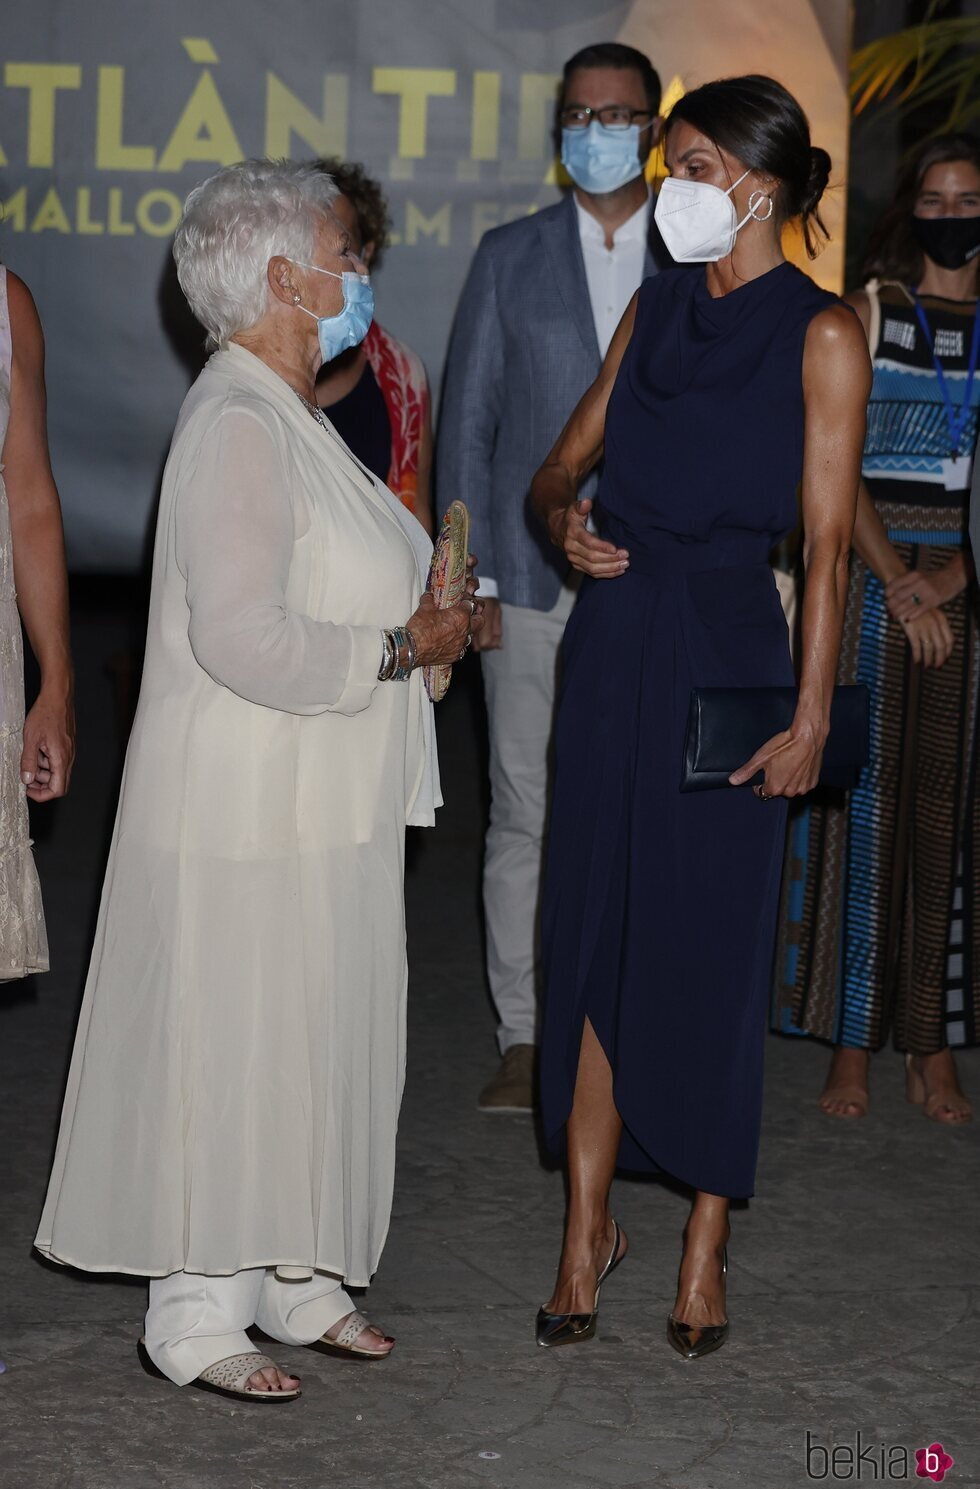 La Reina Letizia y Judi Dench hablando en la clausura del Atlàntida Mallorca Film Fest 2021